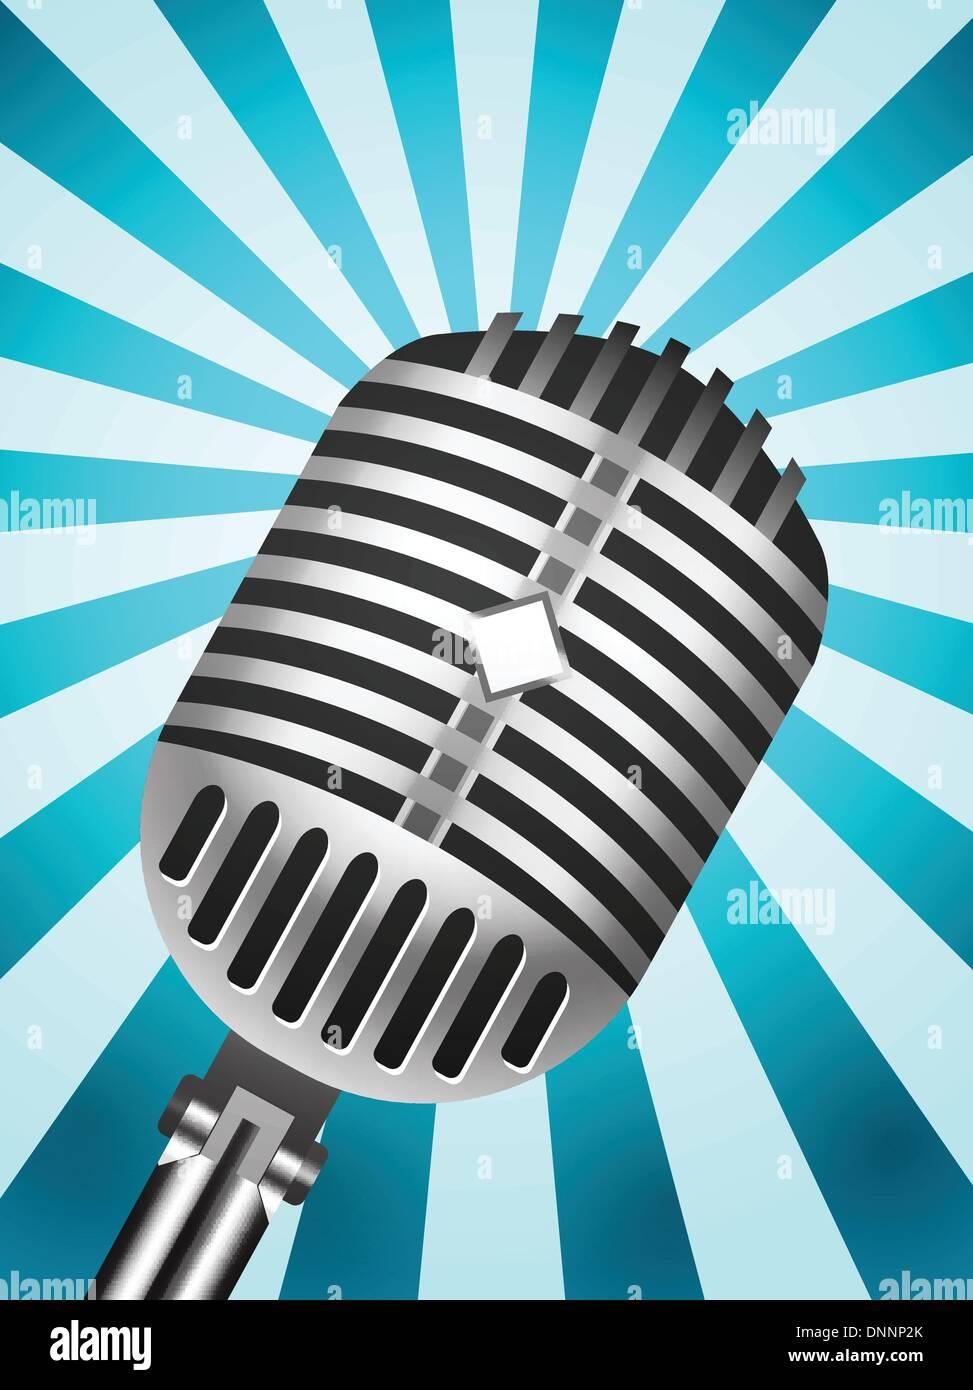 Classic Mikrofon auf ausgekleideten Hintergrund. Vektor-illustration Stockbild